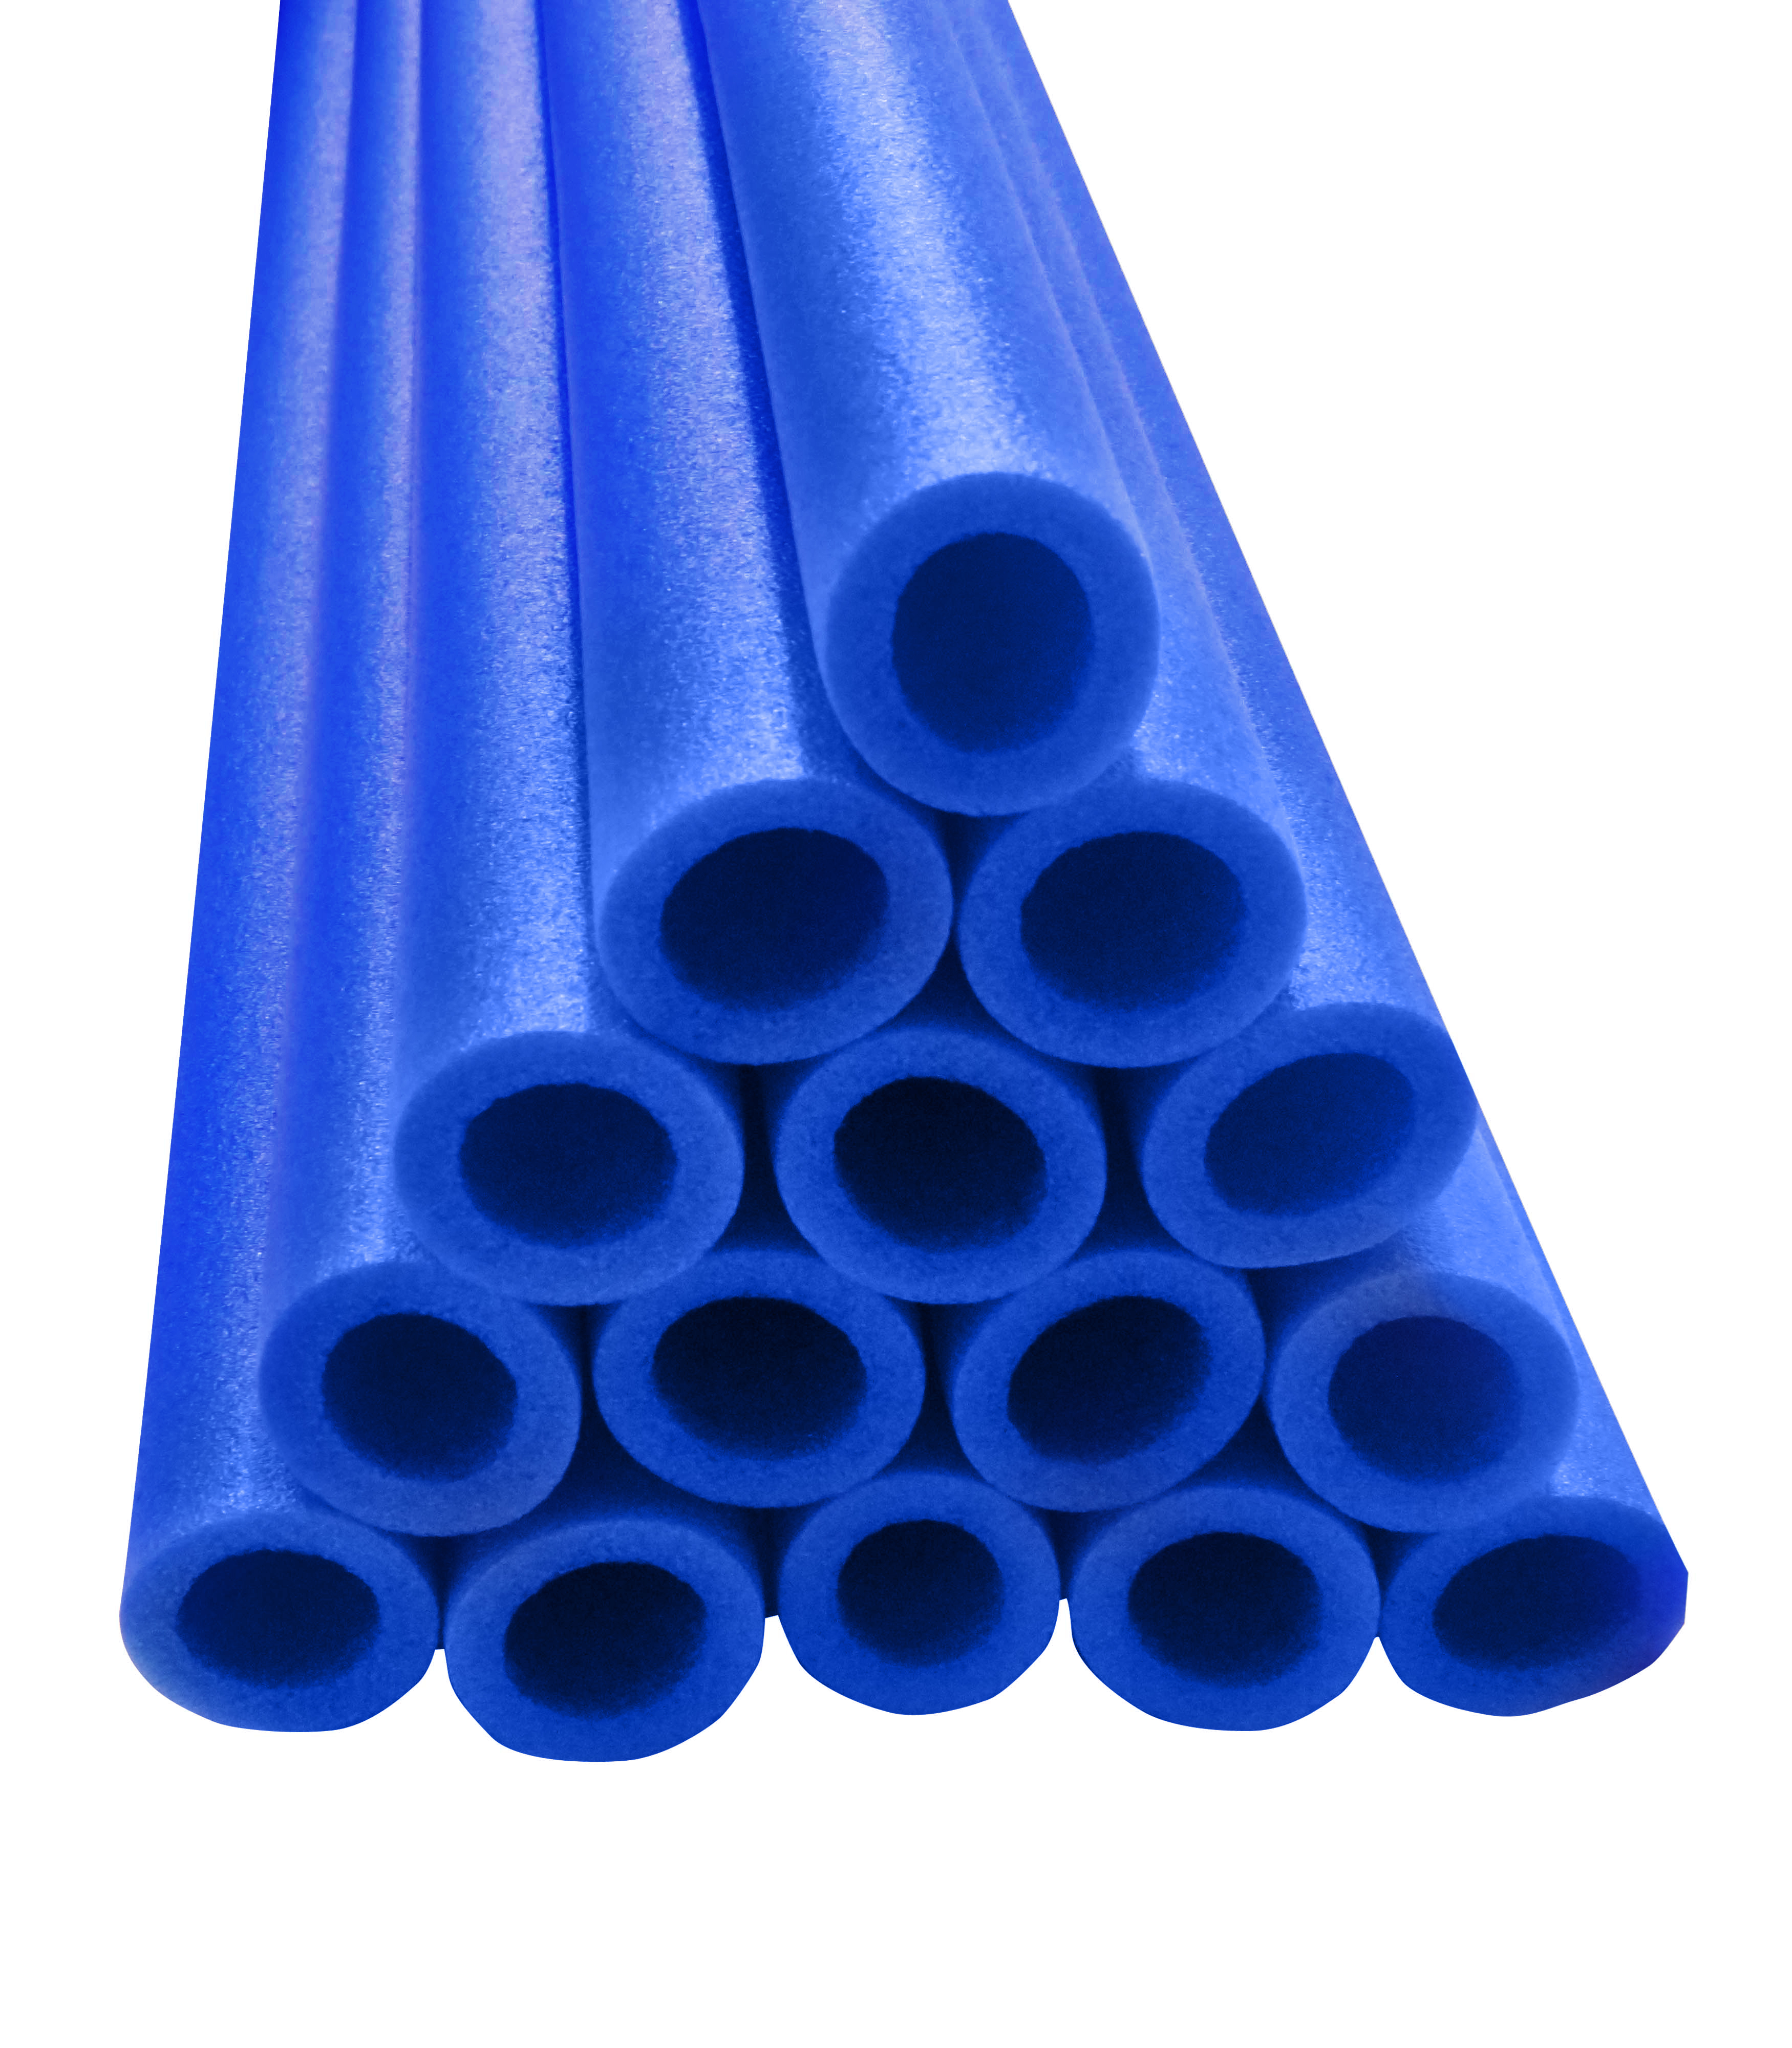 "37 Inch Trampoline Pole Foam sleeves, fits for 1"" Diameter Pole Set of 16 -Blue"